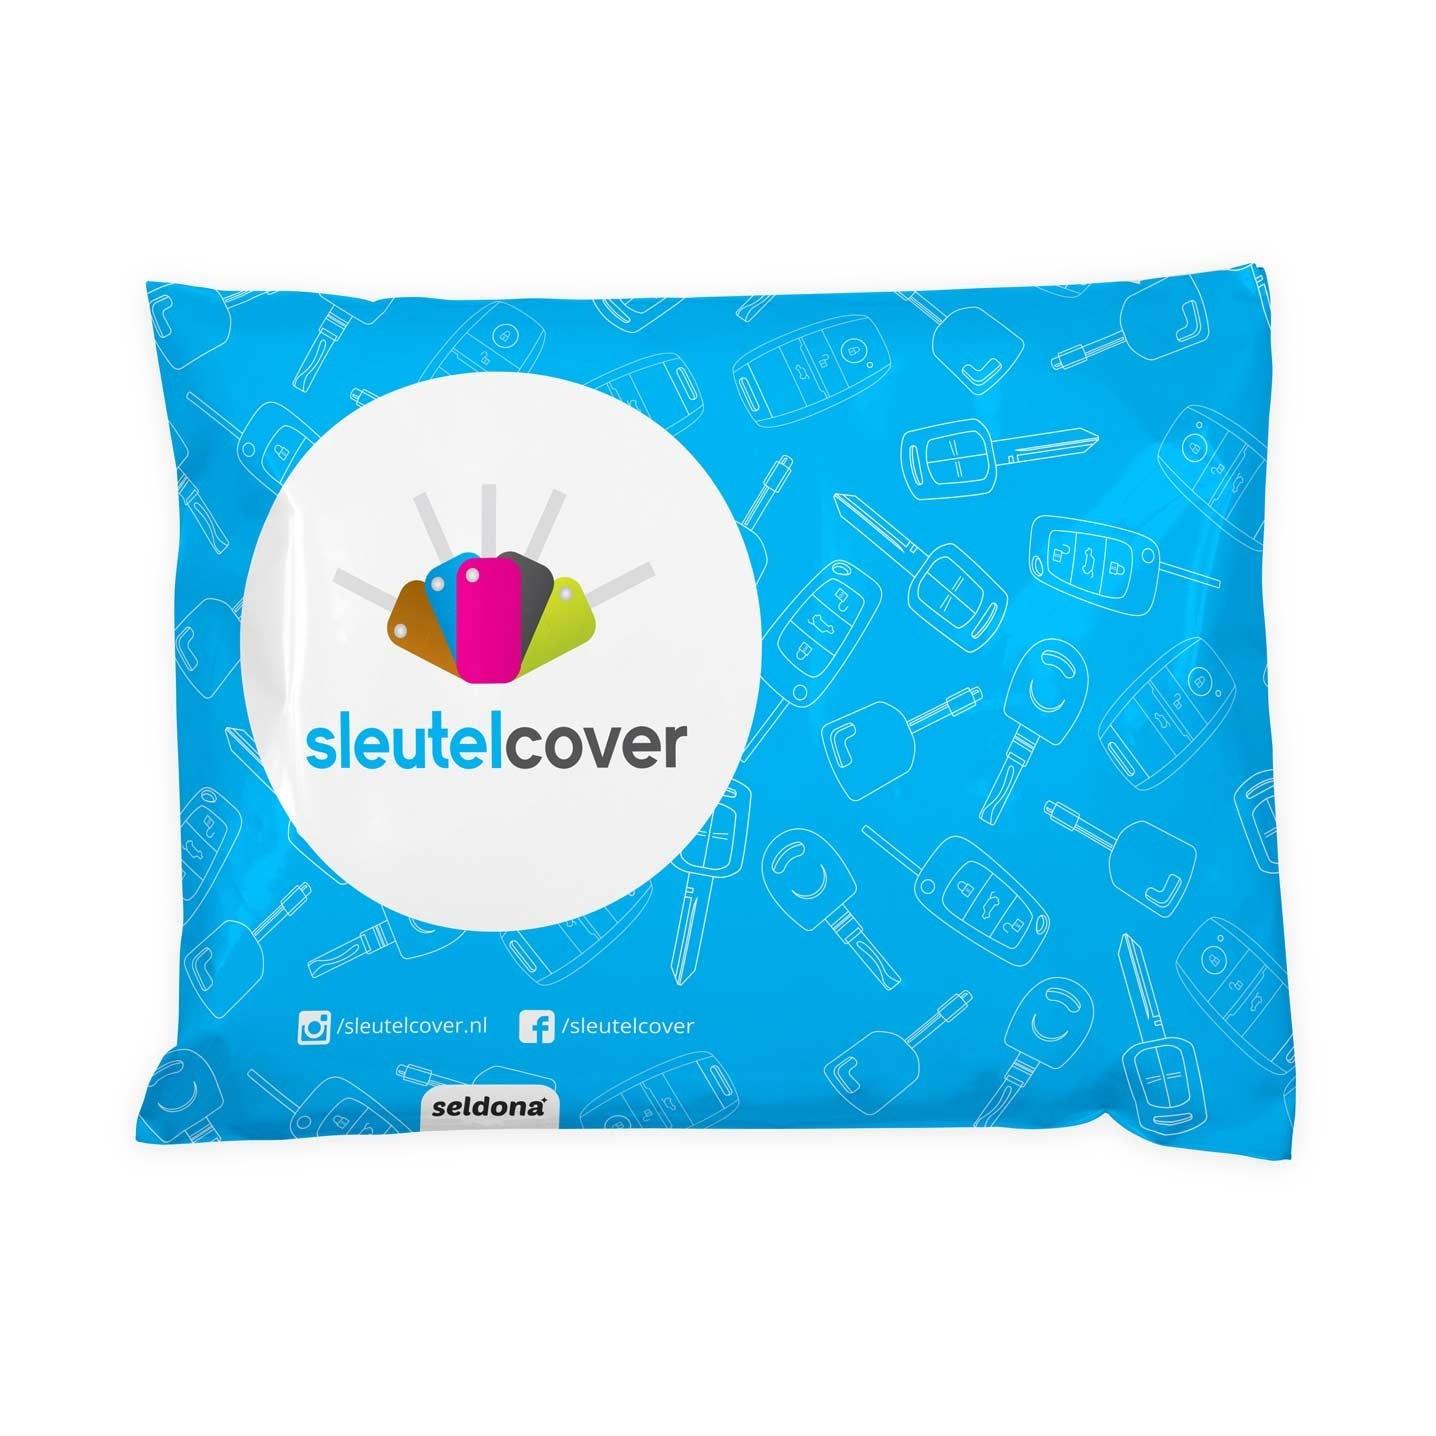 Volvo SleutelCover - Wit / Silicone sleutelhoesje / beschermhoesje autosleutel